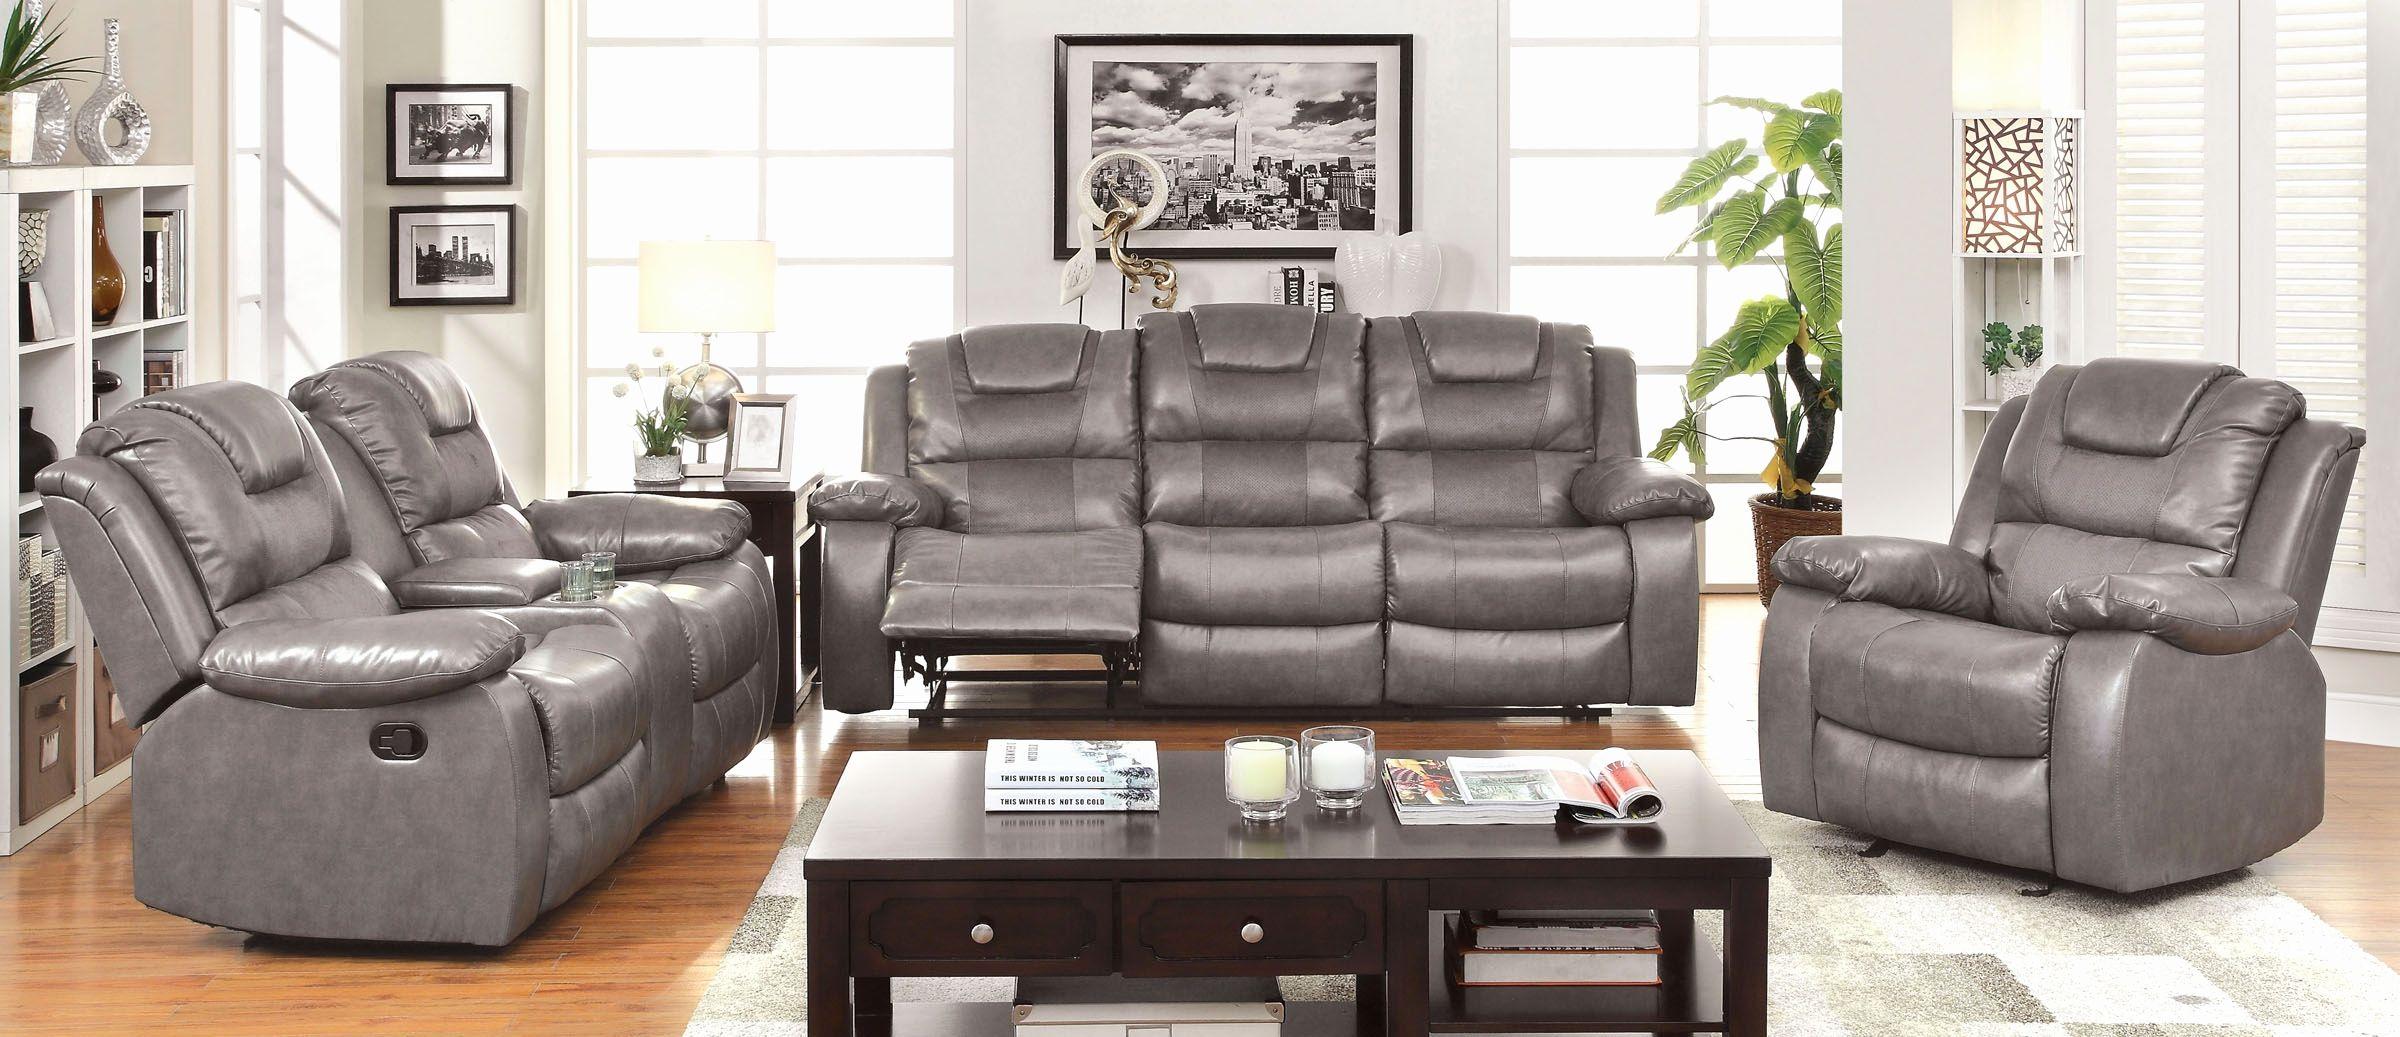 New Microfiber Sofa And Loveseat Set Living Room Reclining Sofa Set  Grandolf In Bonded Leather Index